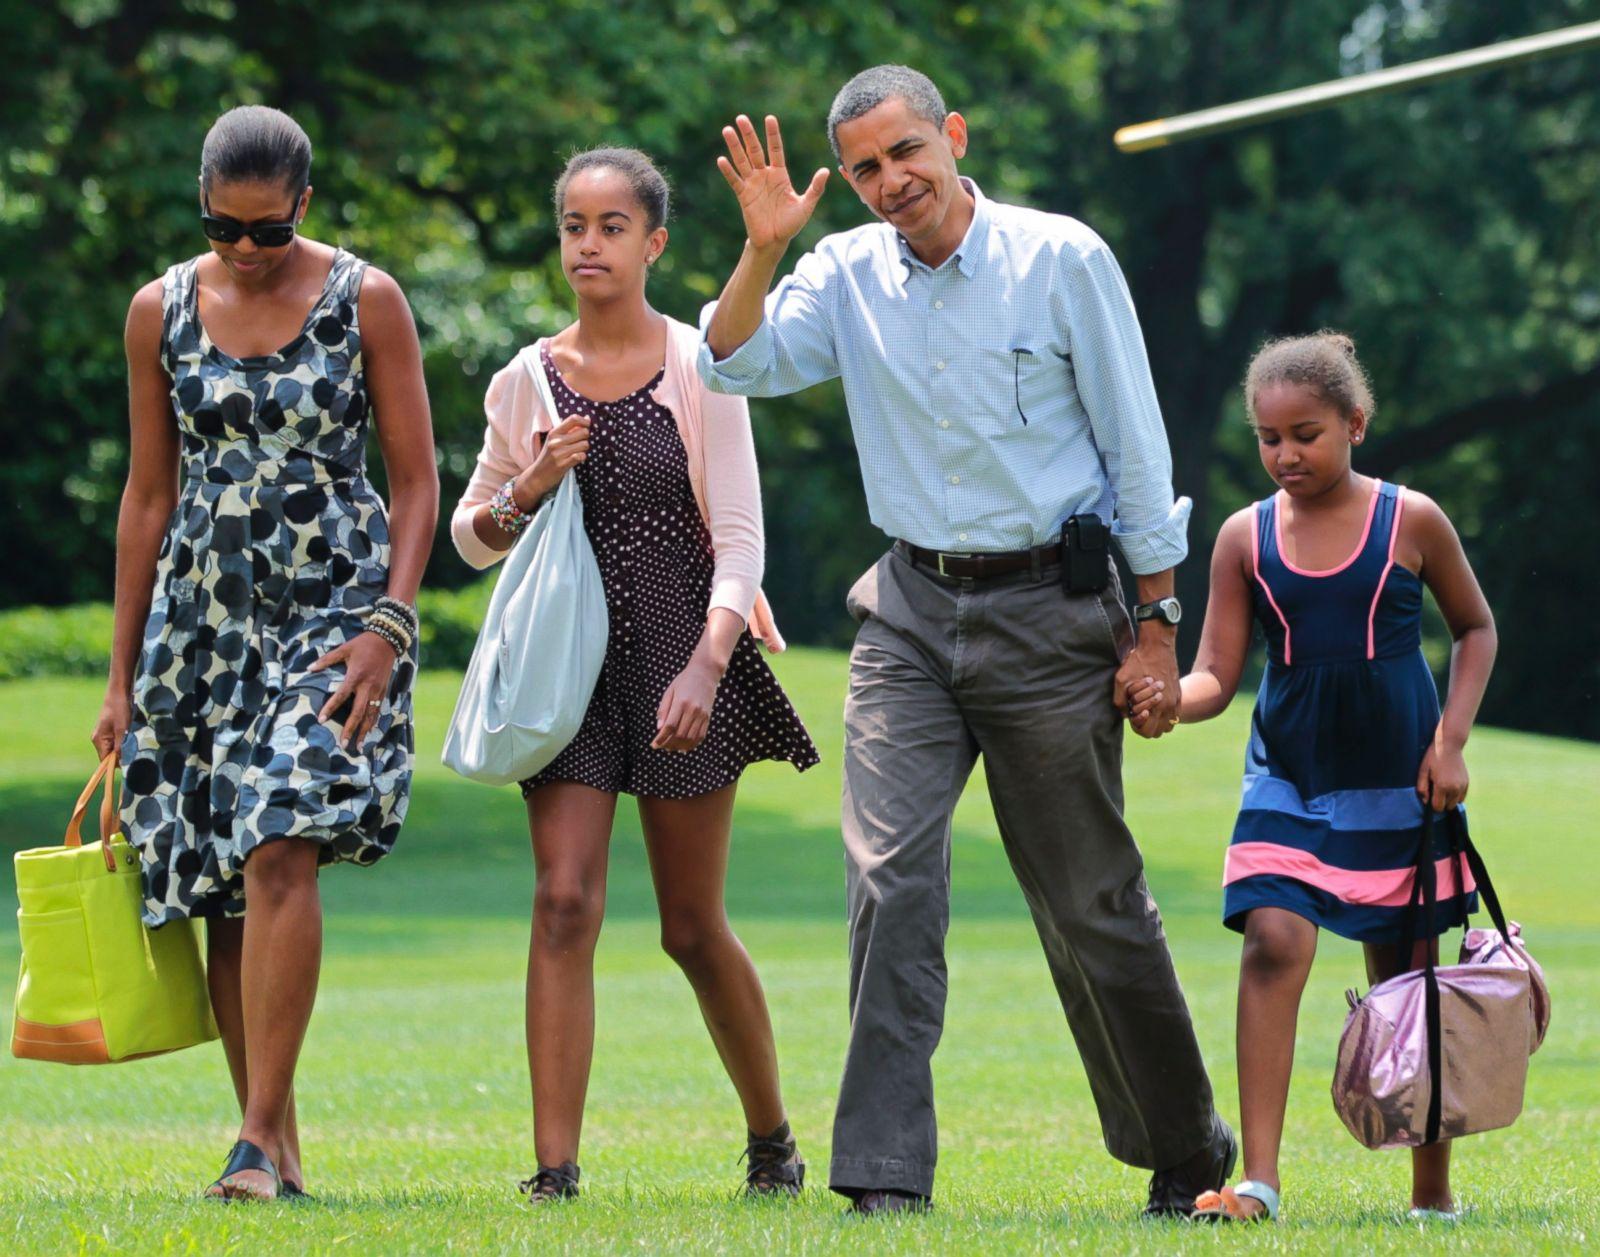 Malia and Sasha Obama Through the Years Photos - ABC News